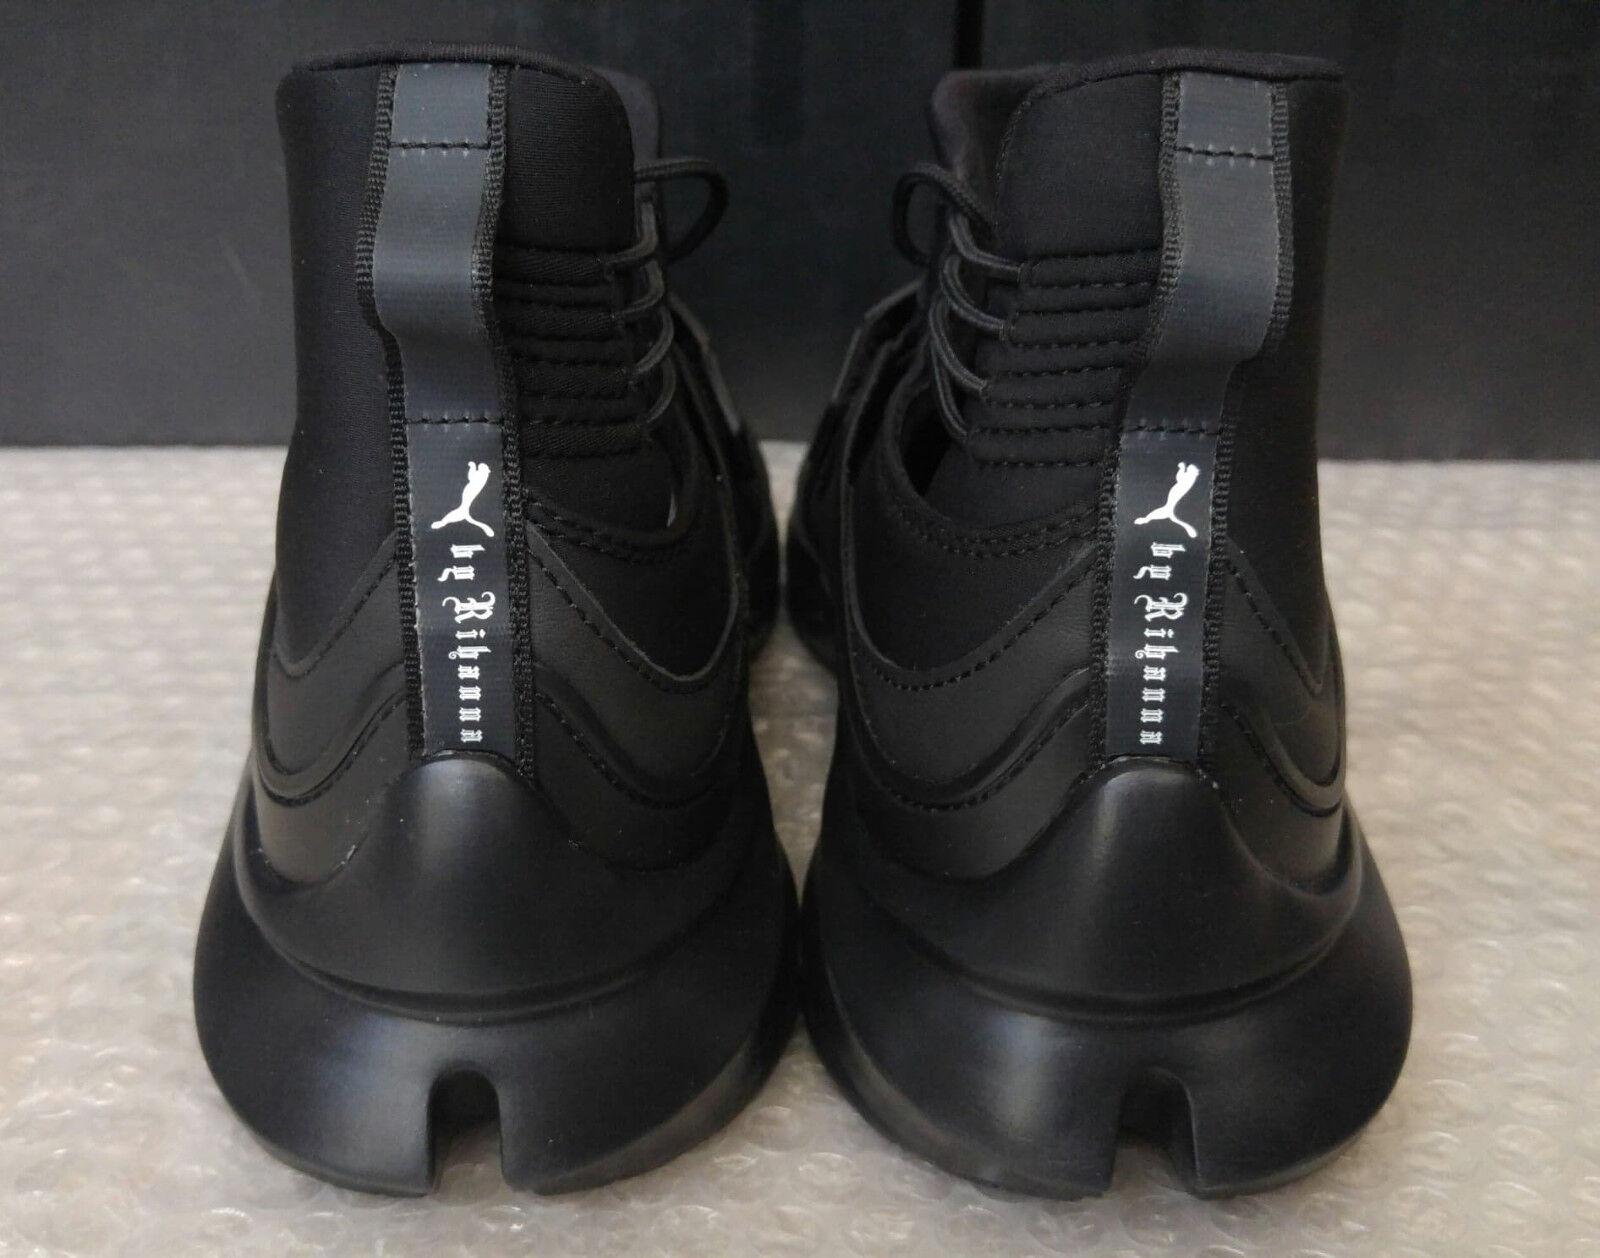 Puma by Rihanna women's black high top sneakers size size size 4UK 3d9697